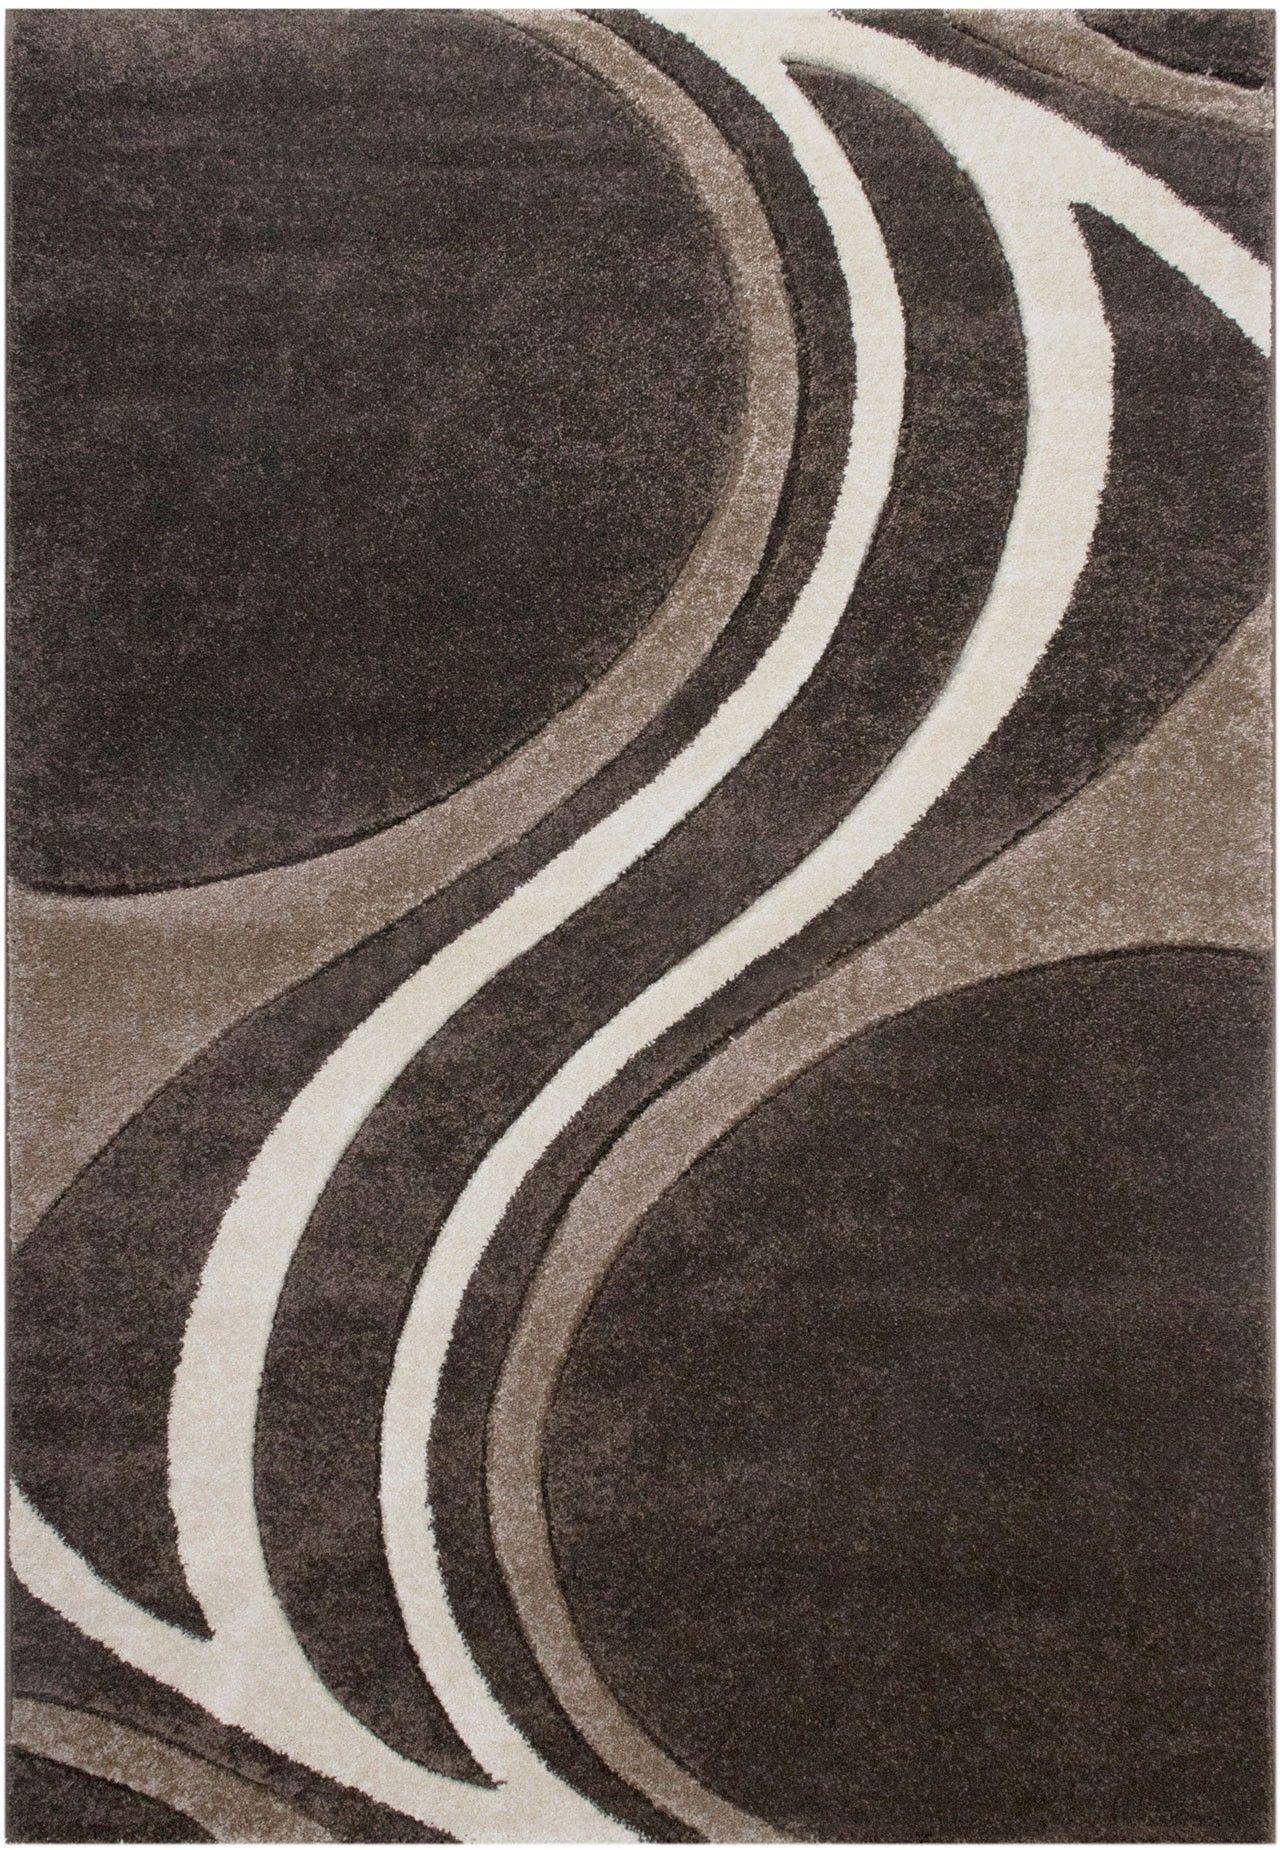 Florida 8006 Brown Teppich Carpet Modern Grau Beige Braun Weiss